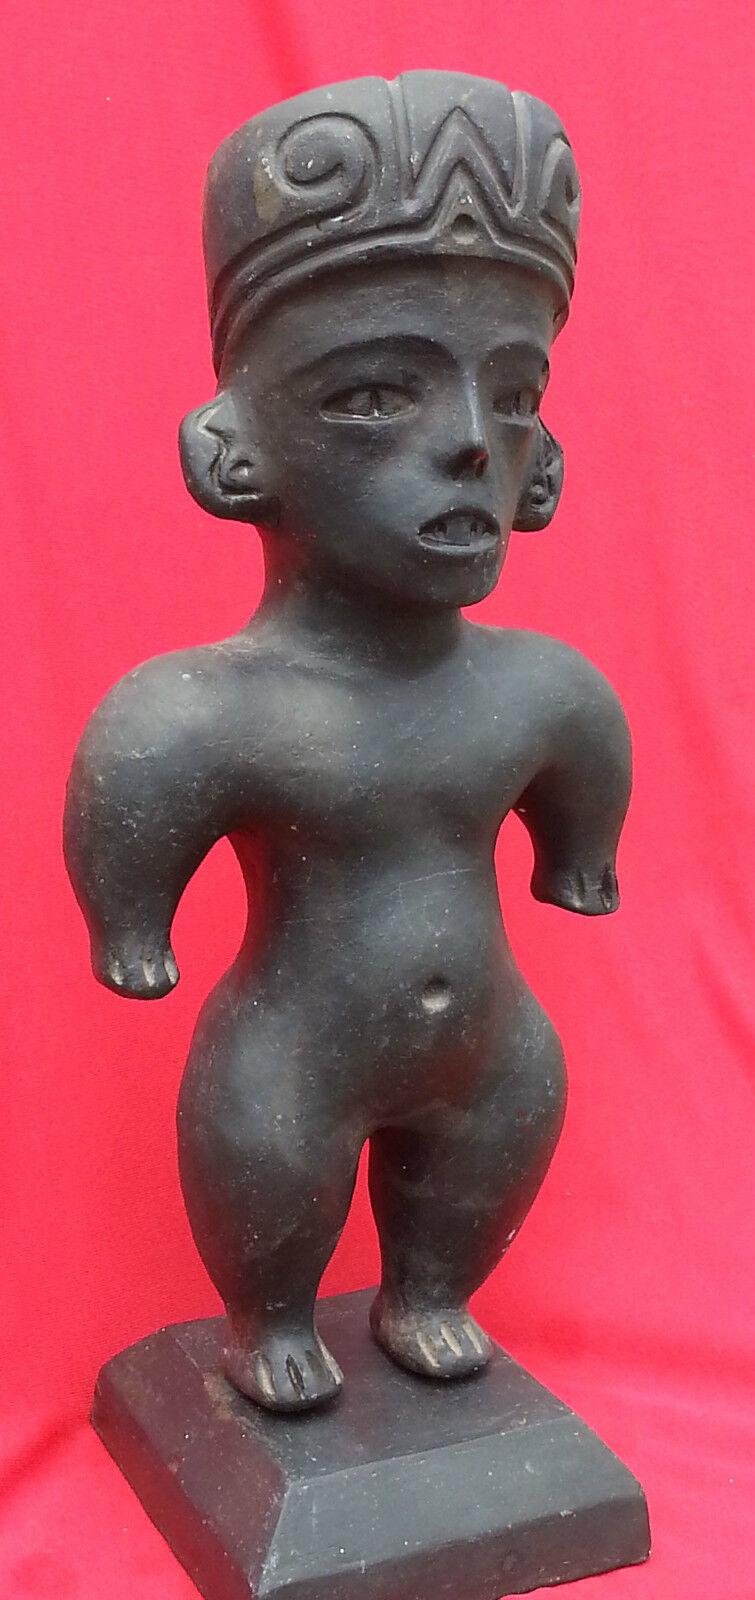 Inca's Dios australiano decorativo de cerámica escultura buque Sydney 1994 49x21x16cm